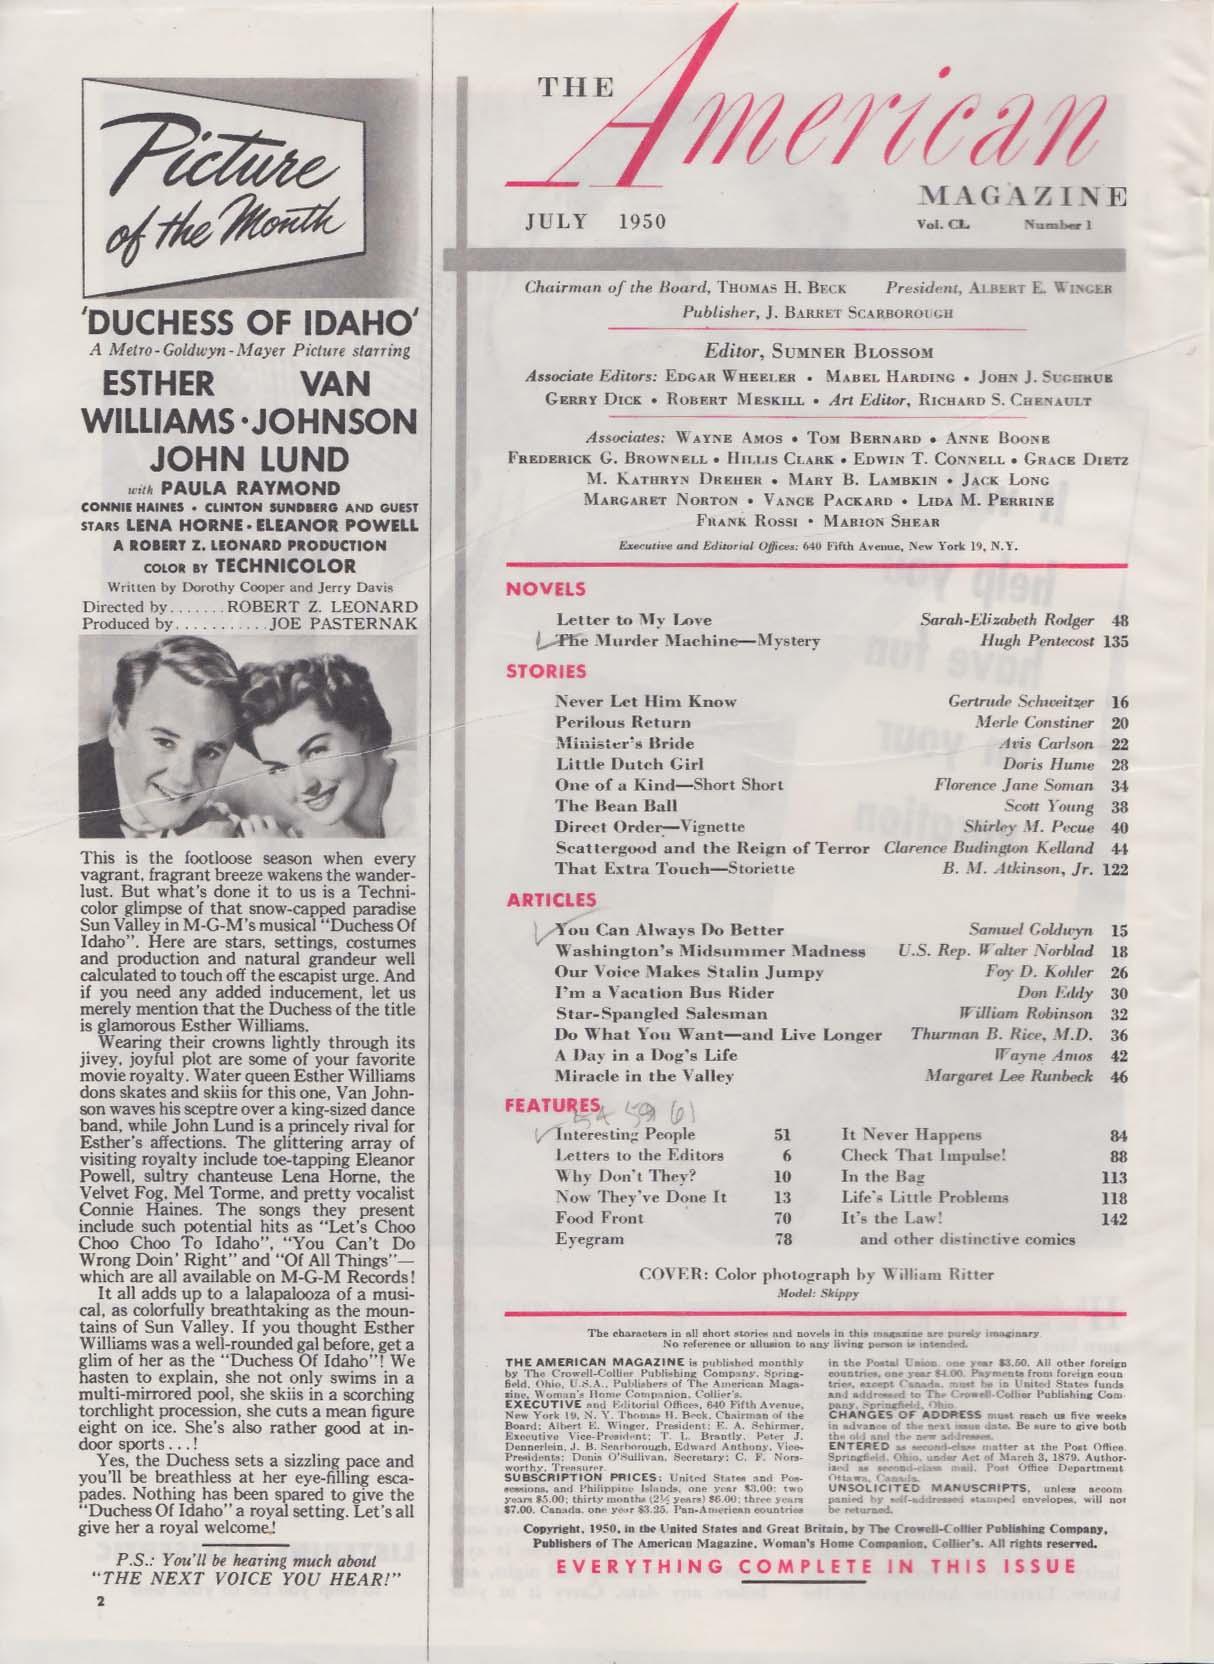 AMERICAN MAGAZINE Hugh Pentecost Samuel Goldwyn Finn Magnus Lola Albright 7 1950